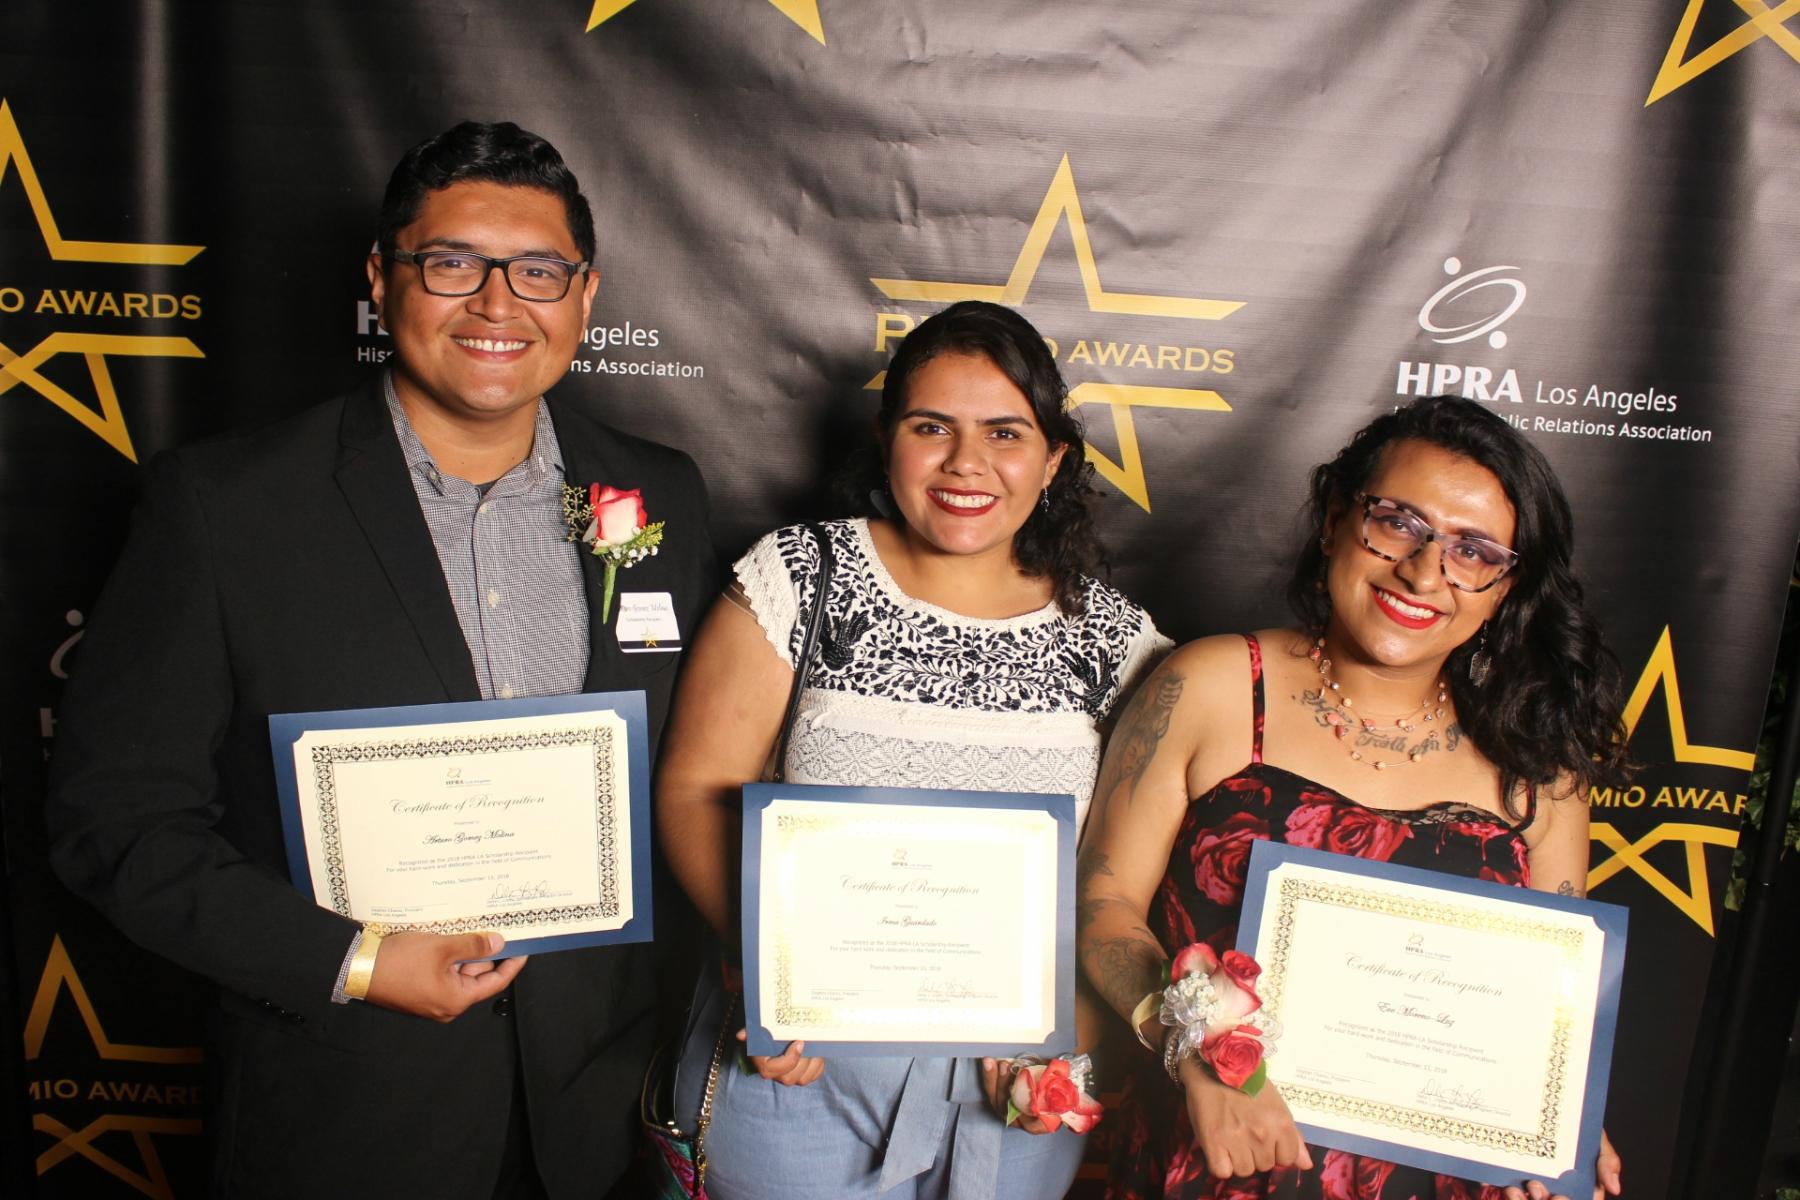 HPRA-LA 2018 Scholarship Winners (left to right): Arturo Gomez Molina; Irma Guardado; Eve Moreno-Luz.